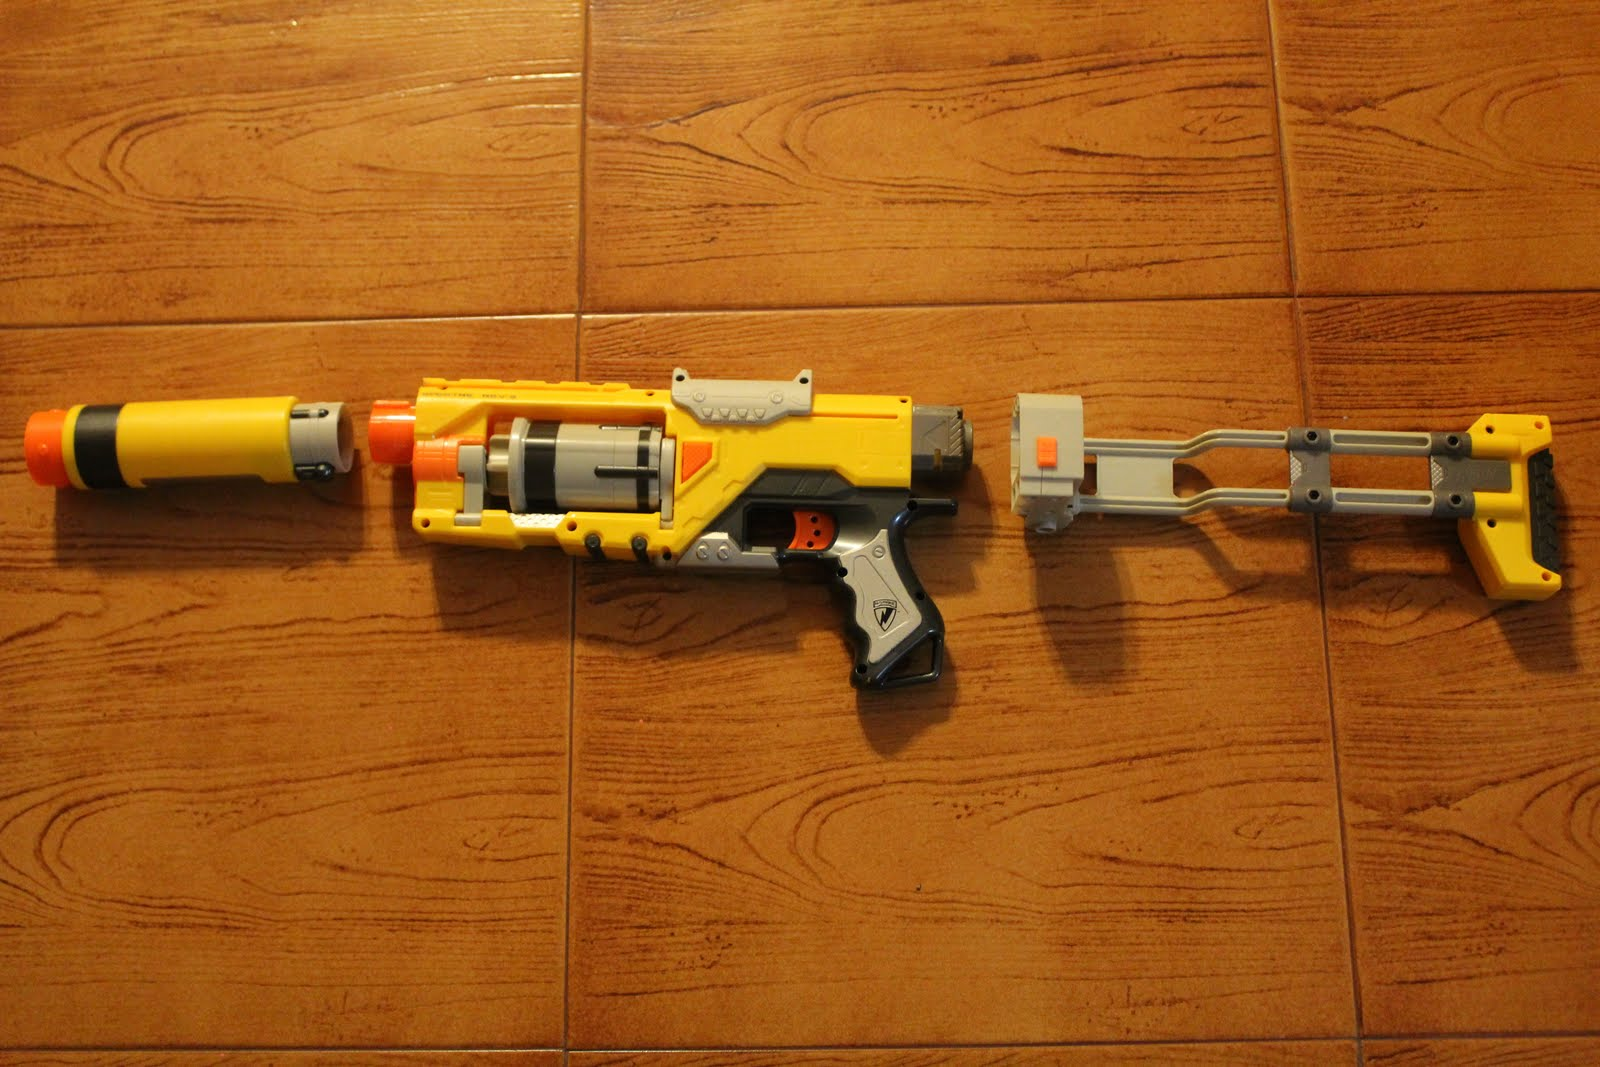 Toys R Us Nerf Guns : Nerf bored people with guns september